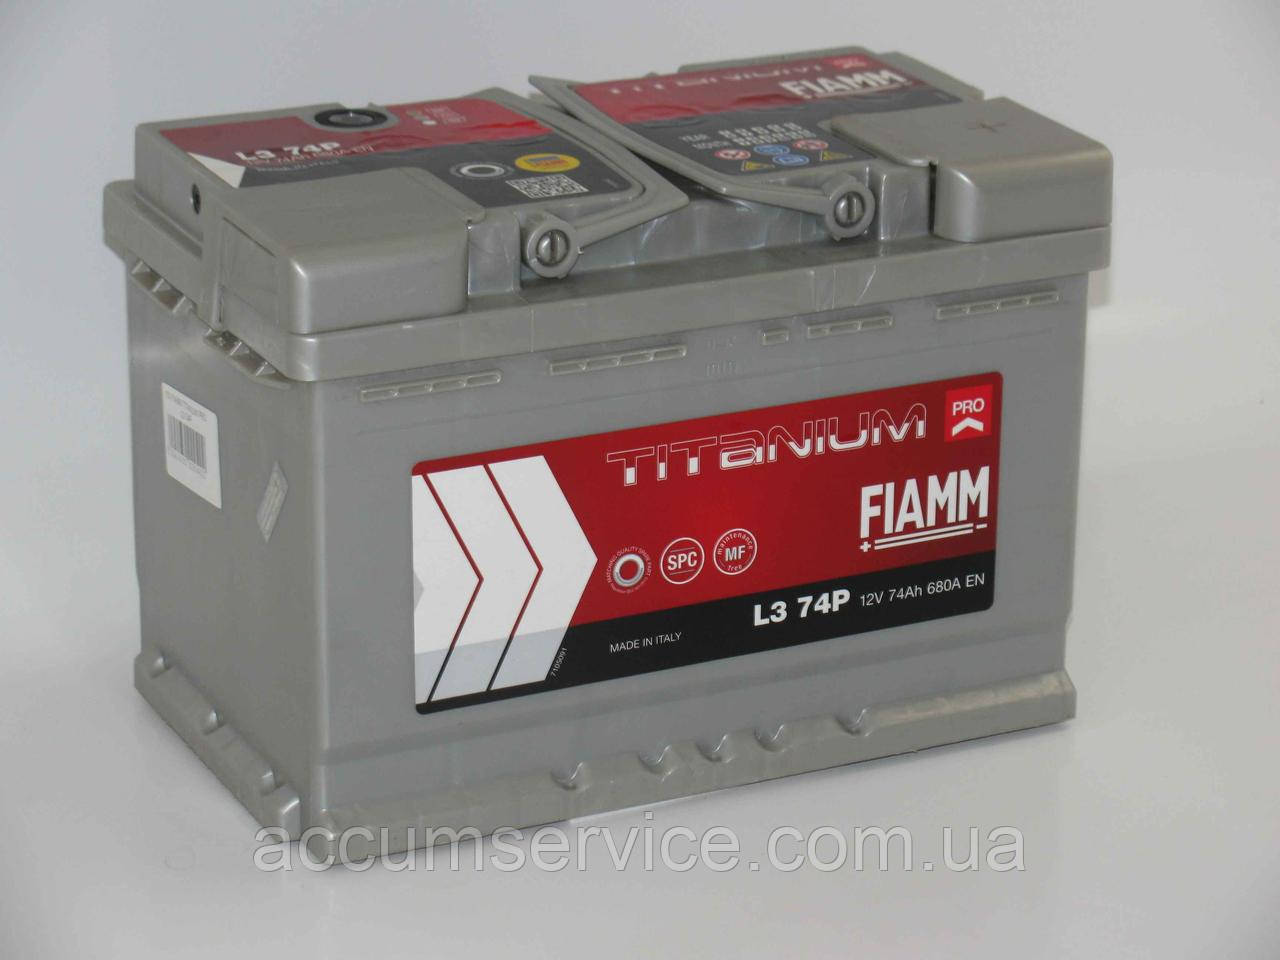 Акумулятор FIAMM TITANIUM PRO L3X 74P